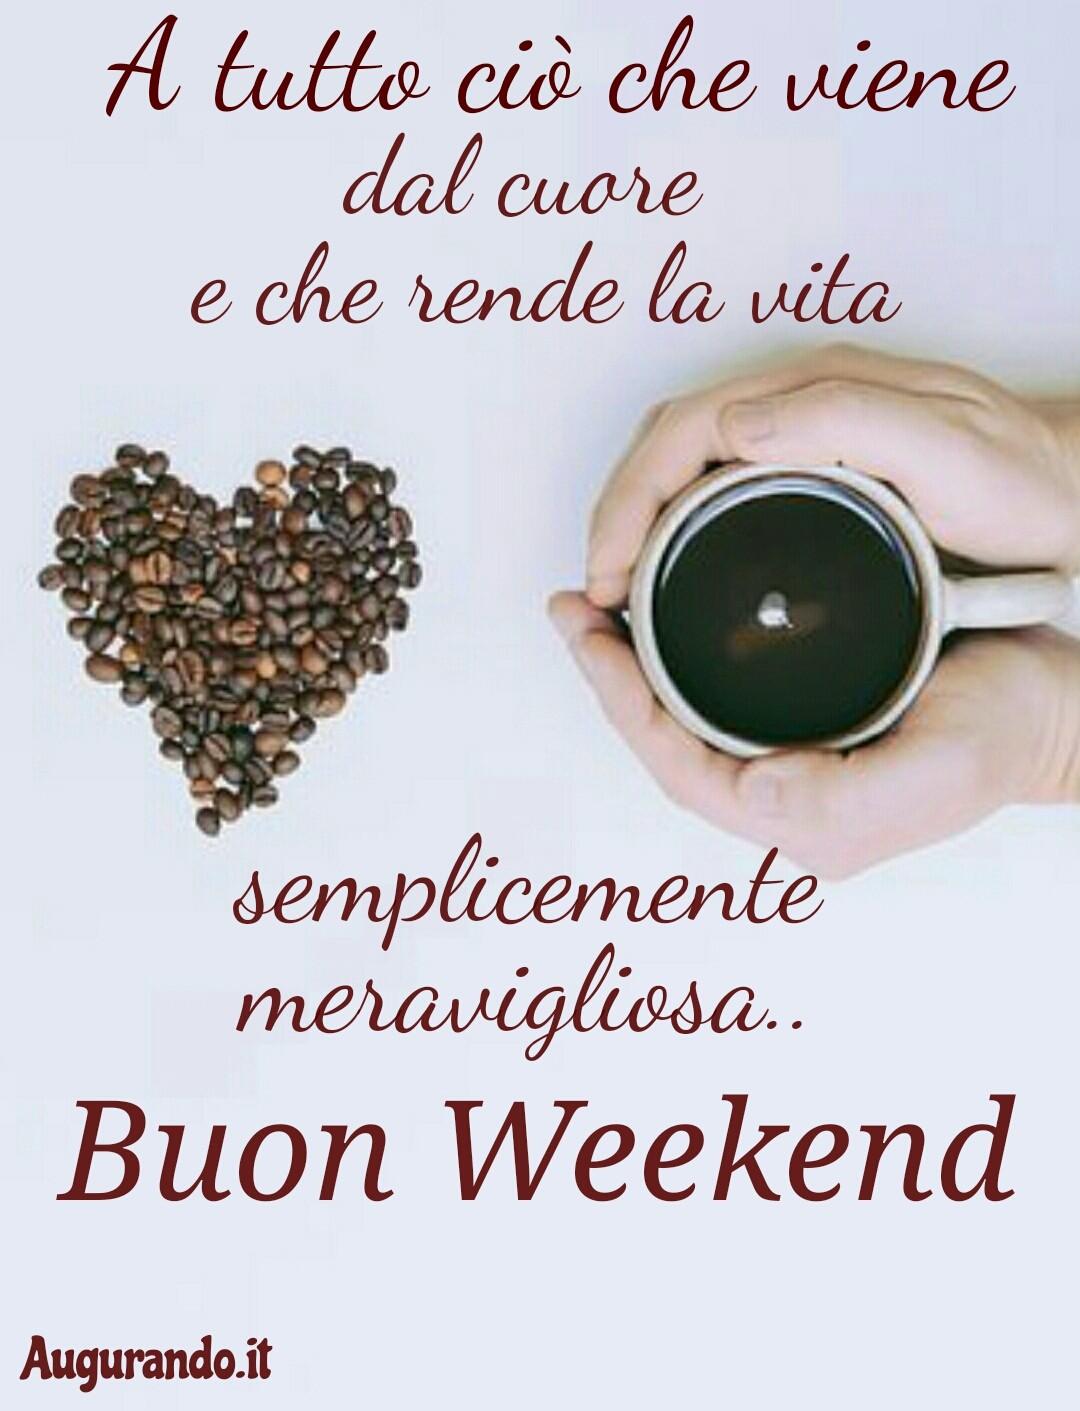 Buon weekend, immagini weekend, sereno fine settimana, immagini fine settimana, buon fine settimana, weekend, sereno fine settimana, sereno weekend, buon weekend a tutti,